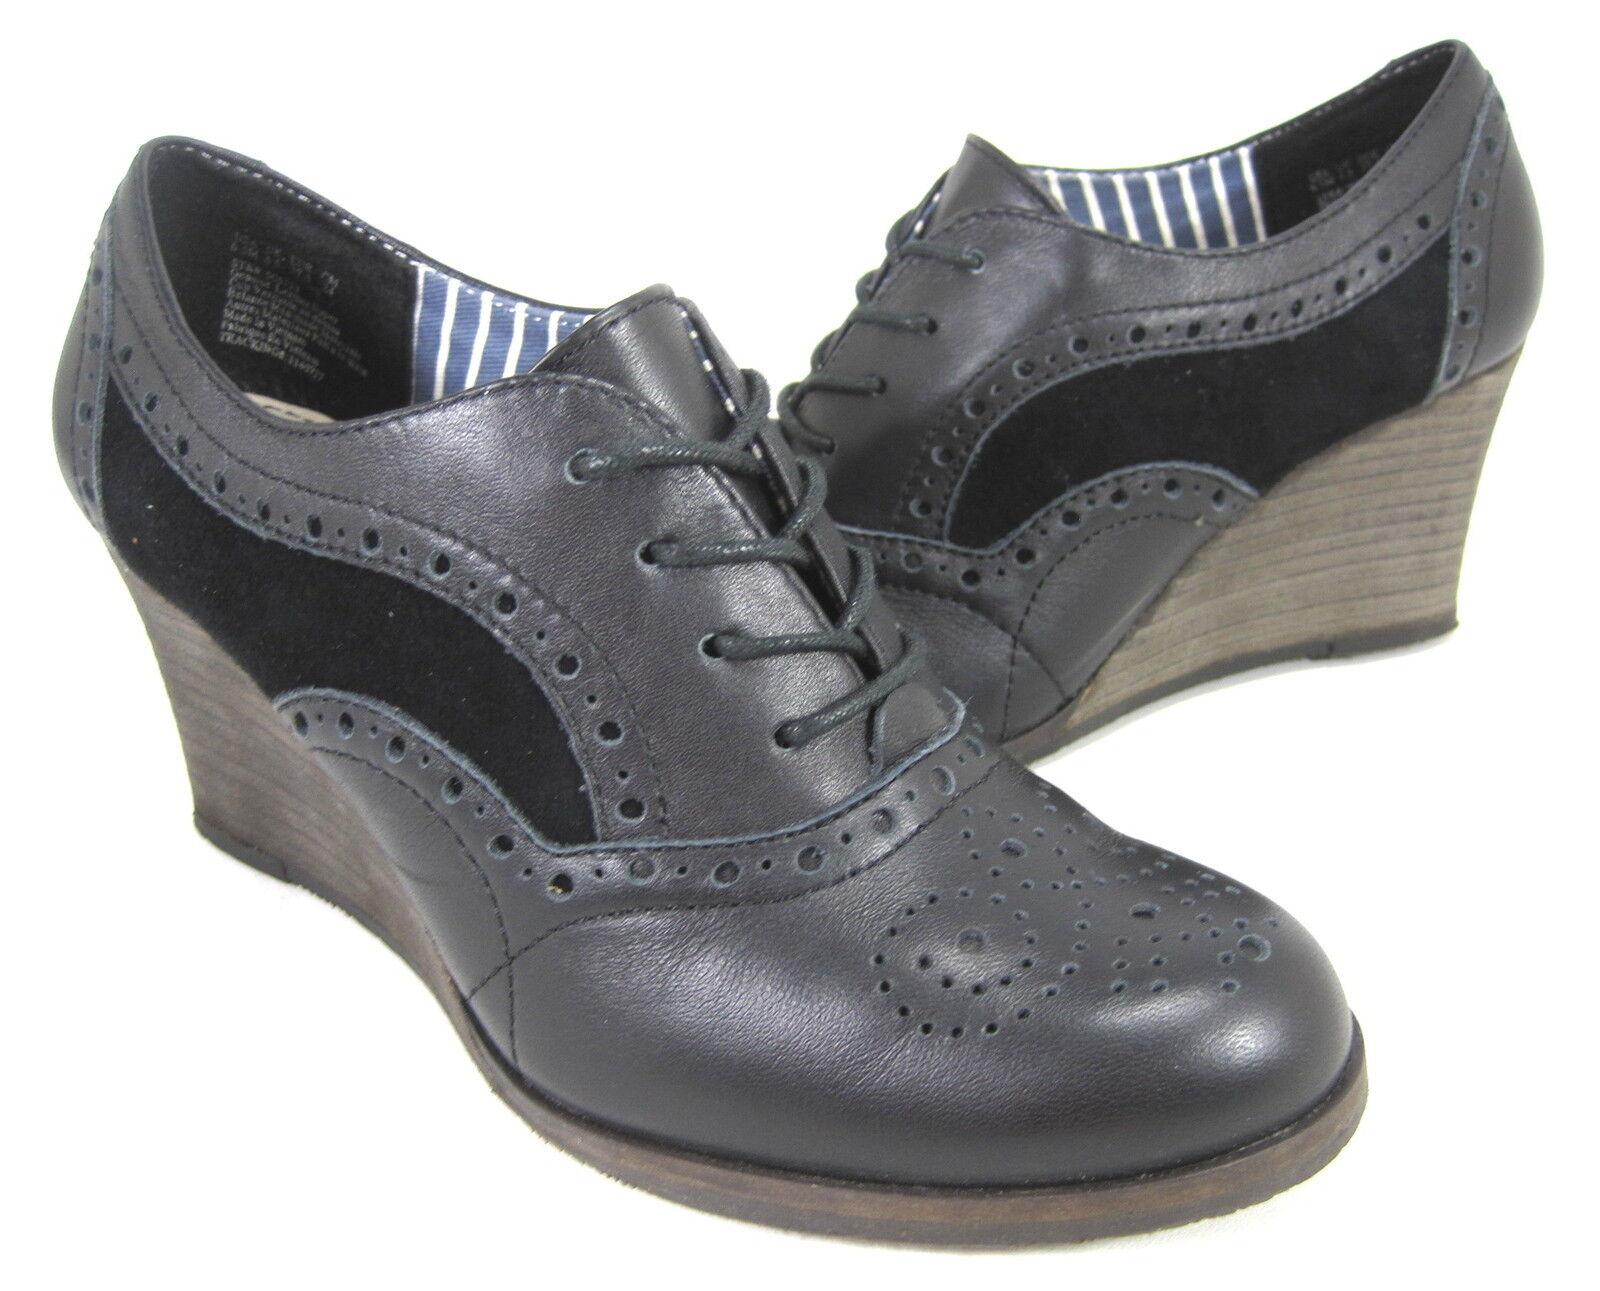 l'ultimo HUSH PUPPIES donna TYRO OXFORD WEDGE PUMP nero LEATHER US US US SZ 6.5 MEDIUM (B)M  negozio a basso costo